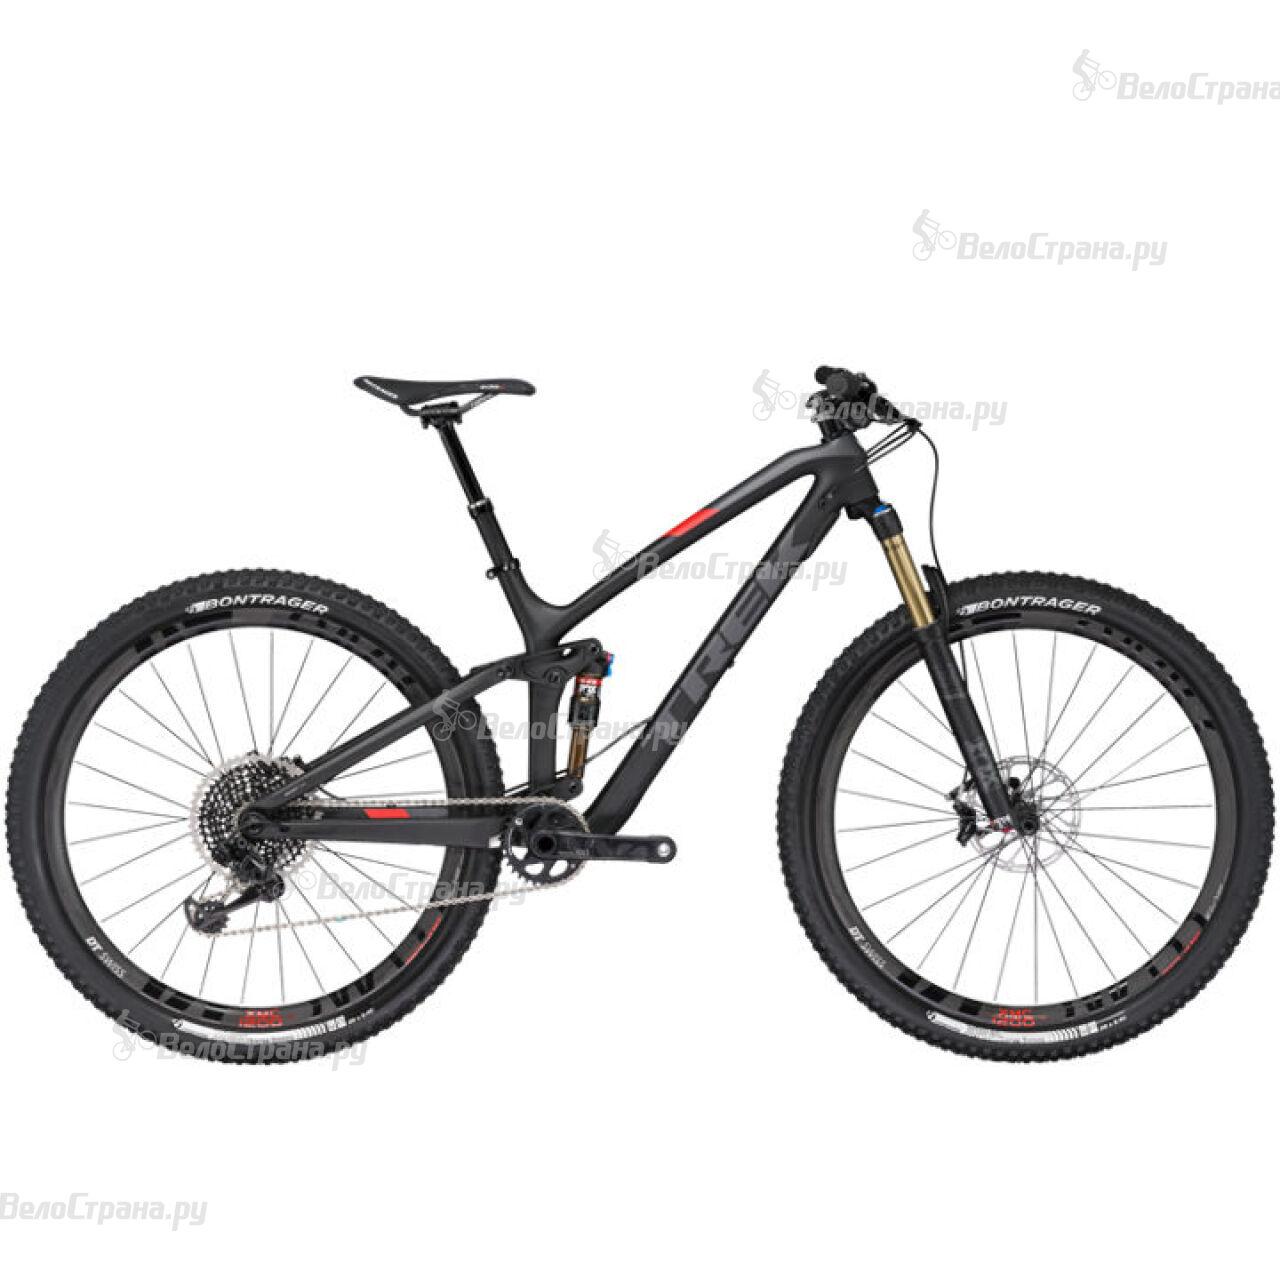 Велосипед Trek Fuel EX 9.9 29 (2017) велосипед trek fuel ex 9 29 2017